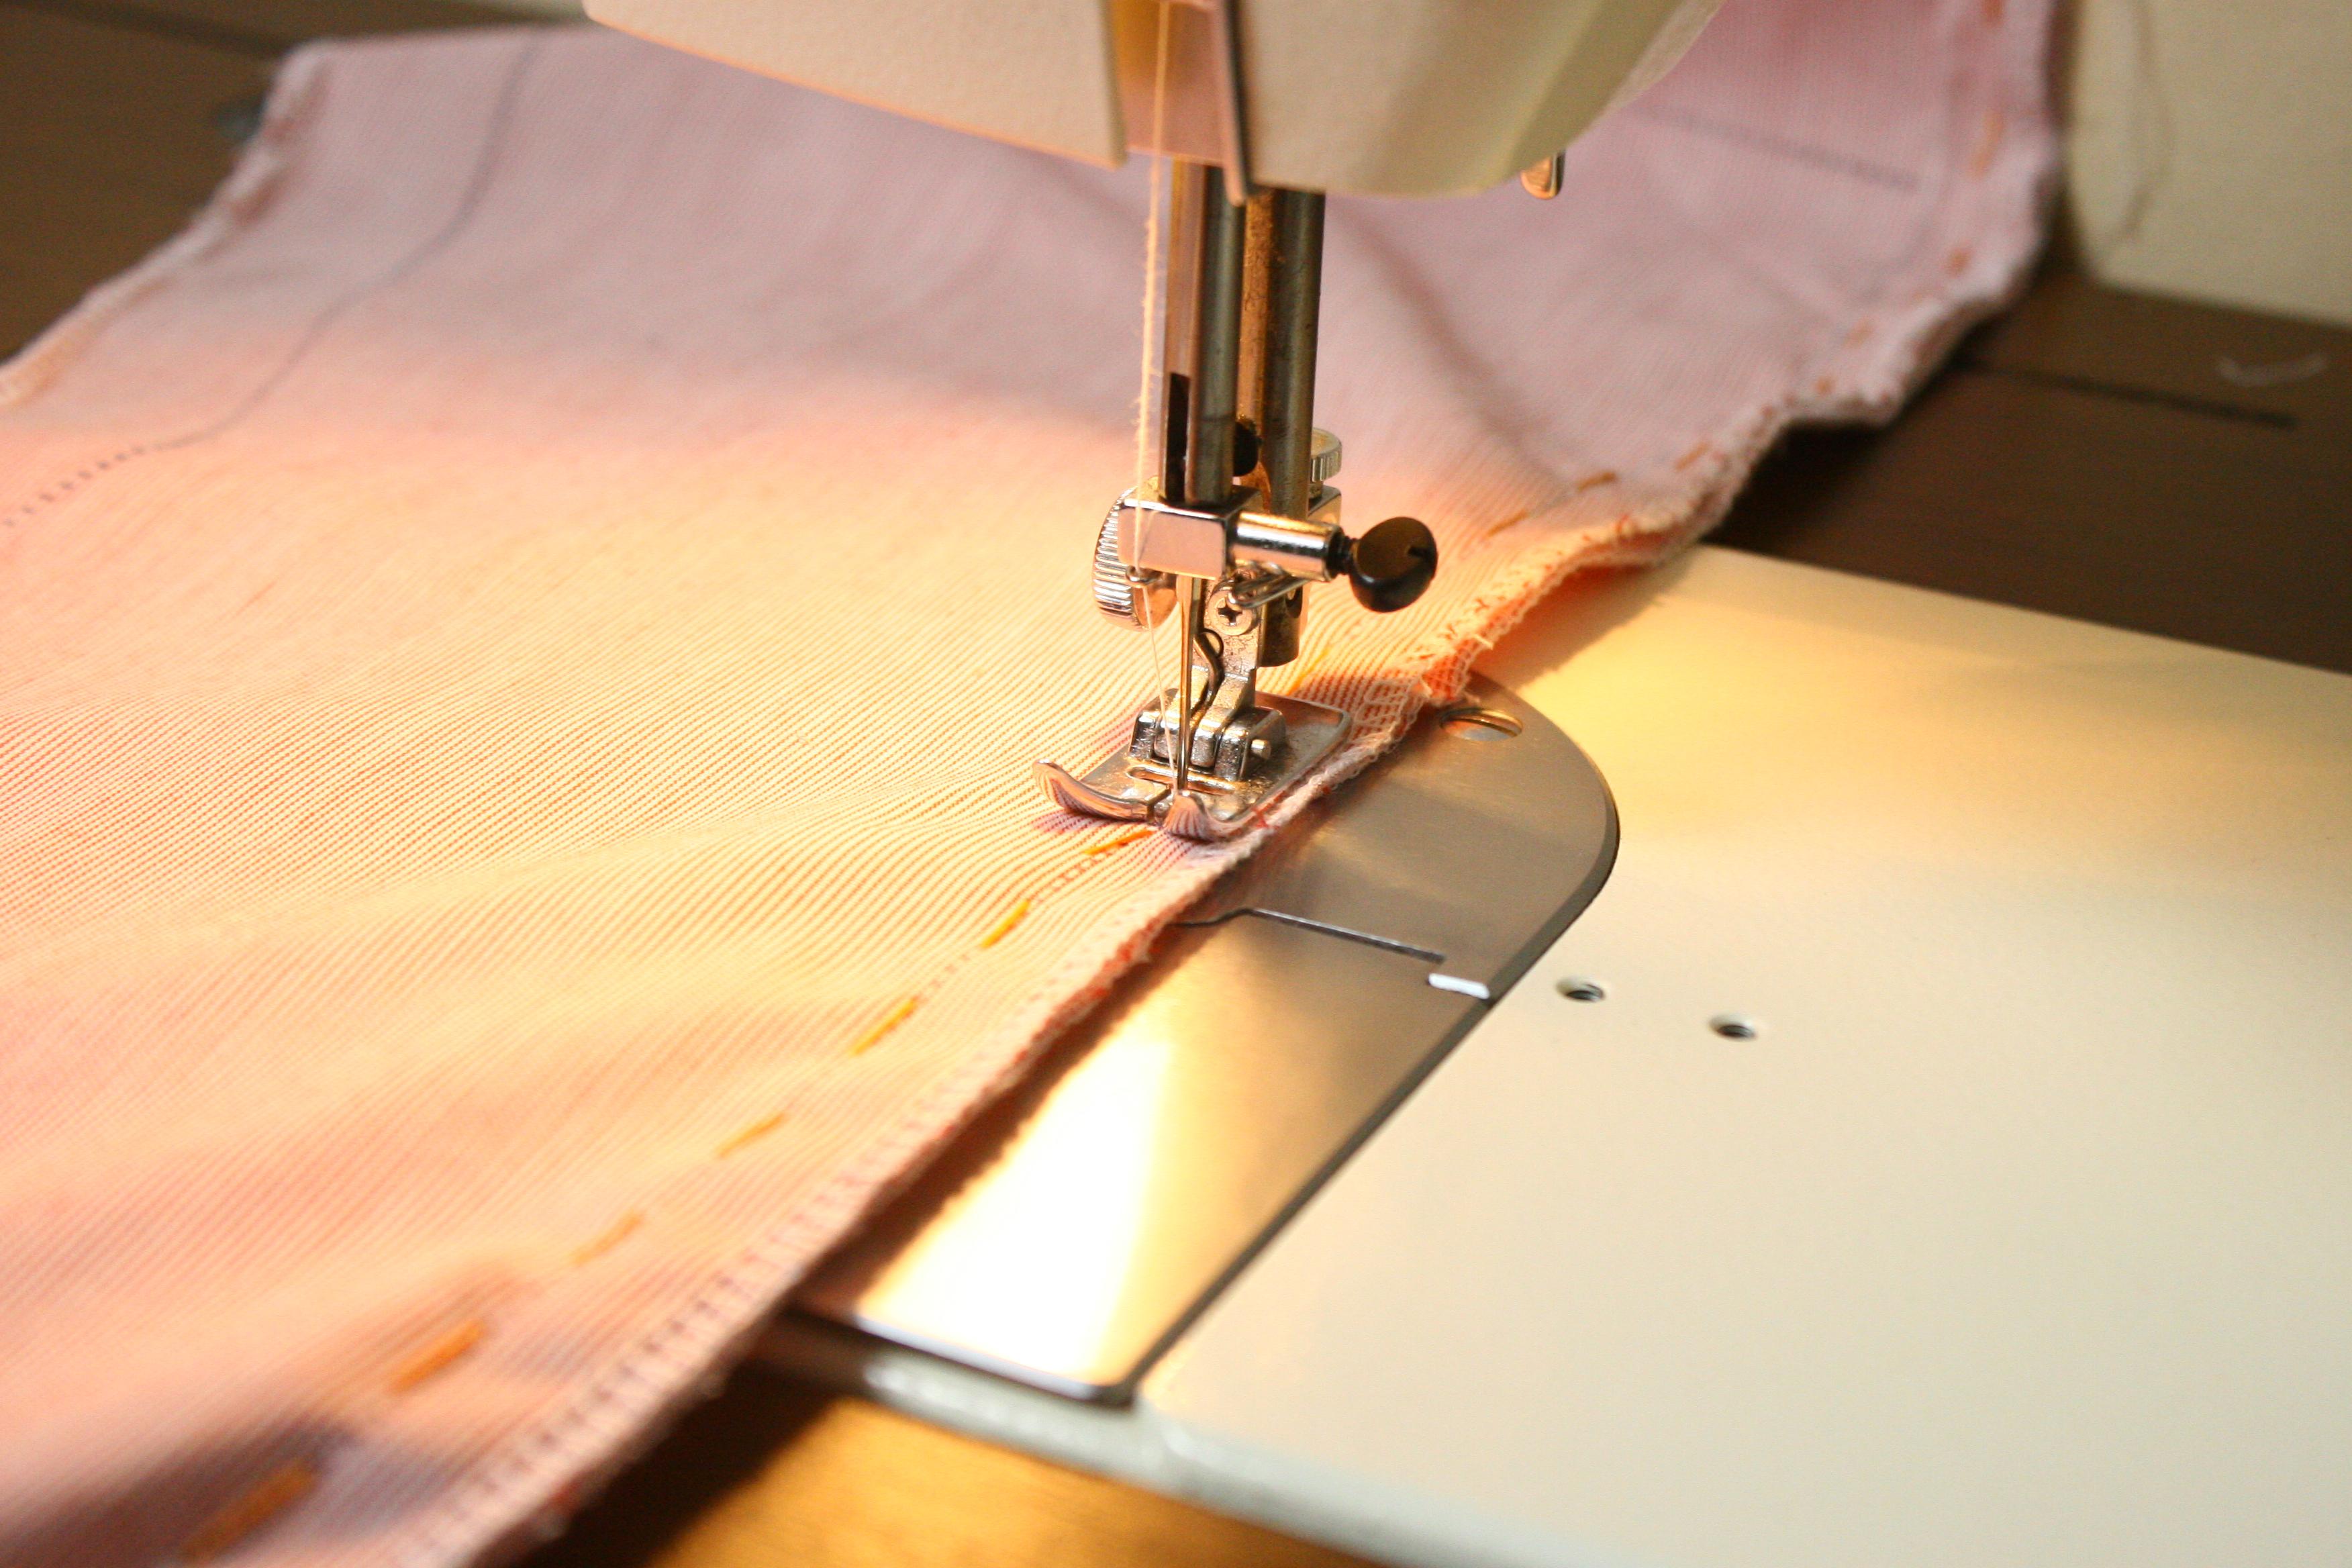 Factory Clothing Production Bali